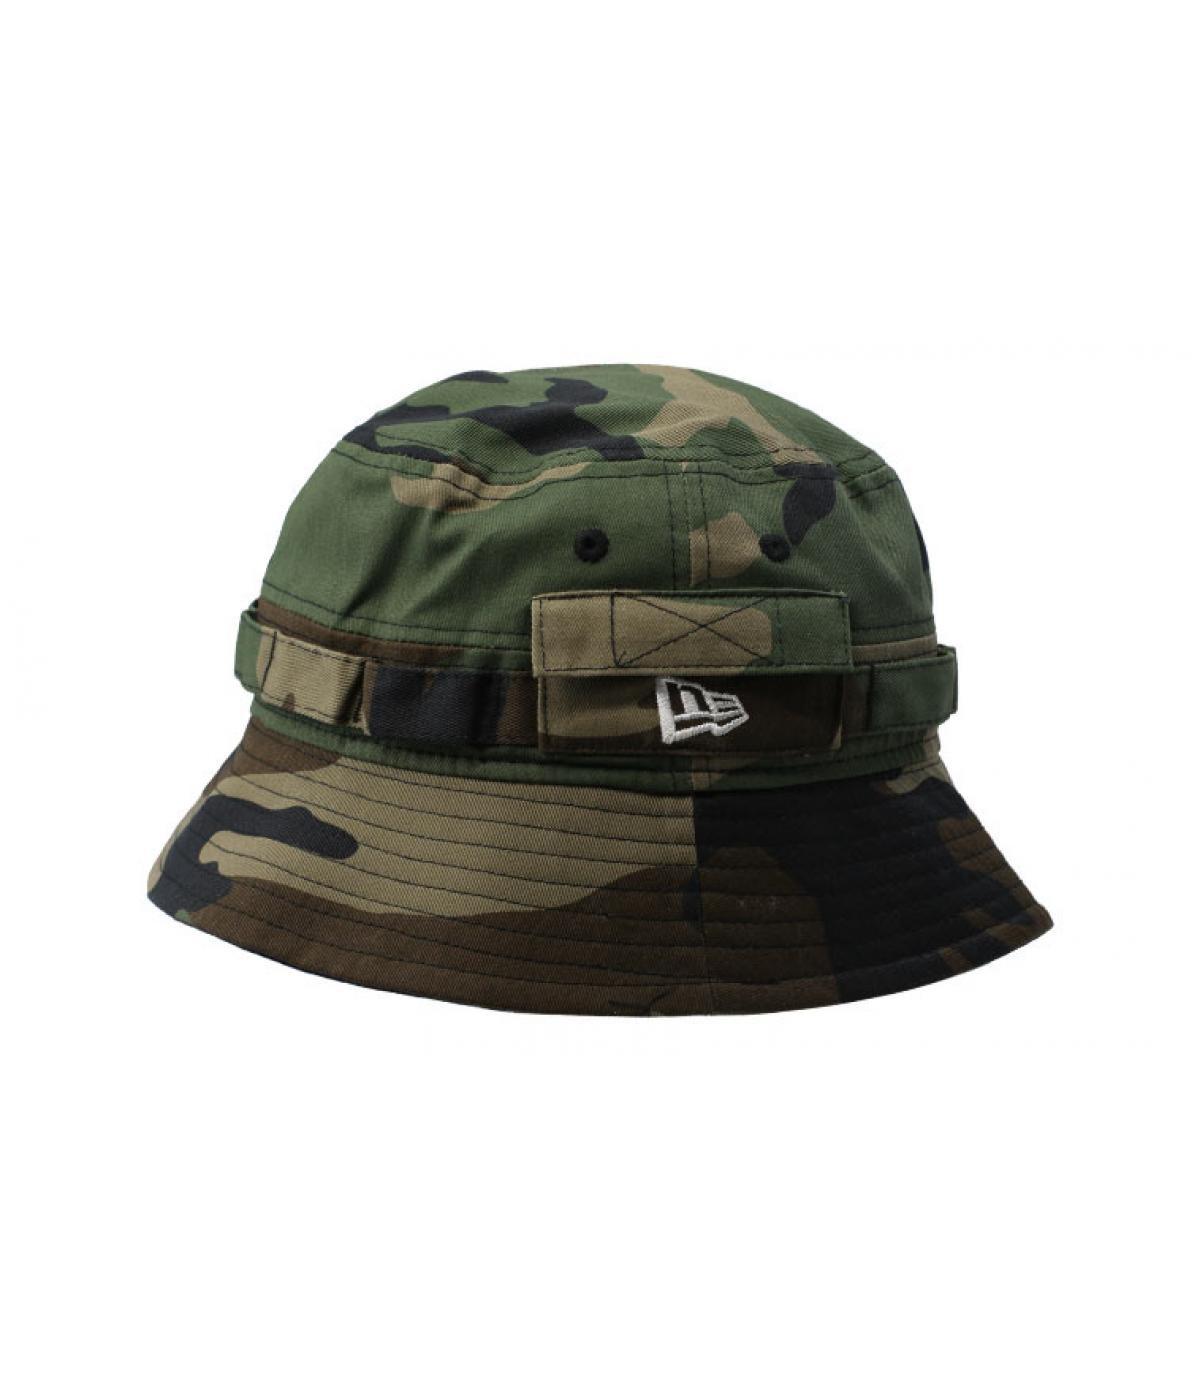 fdbccabb New Era bucket hat camo - Bucket Explorer NE woodland camo by New ...